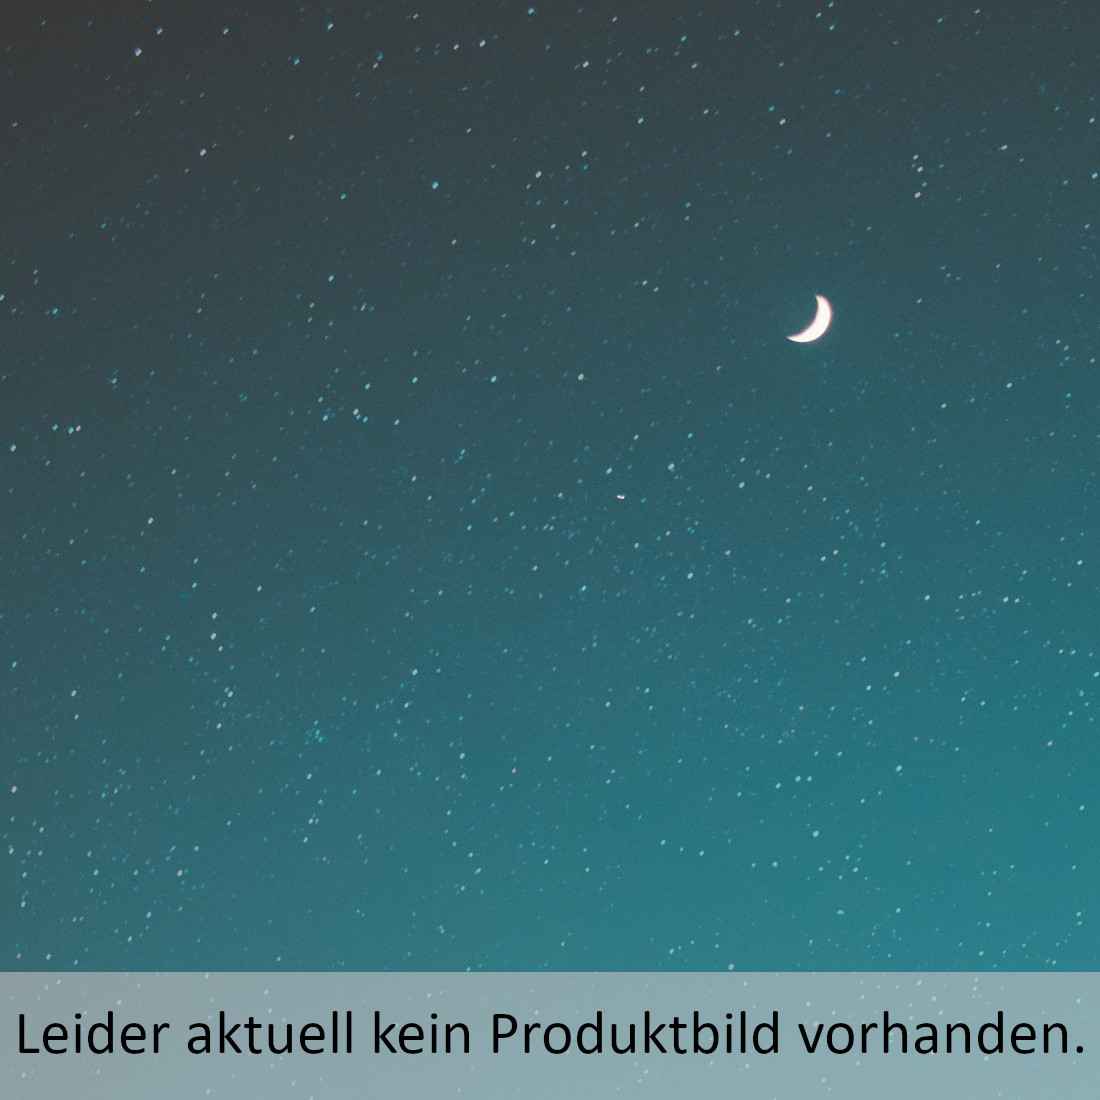 Jede Menge Leben Vorländer, Karin 9783761558461